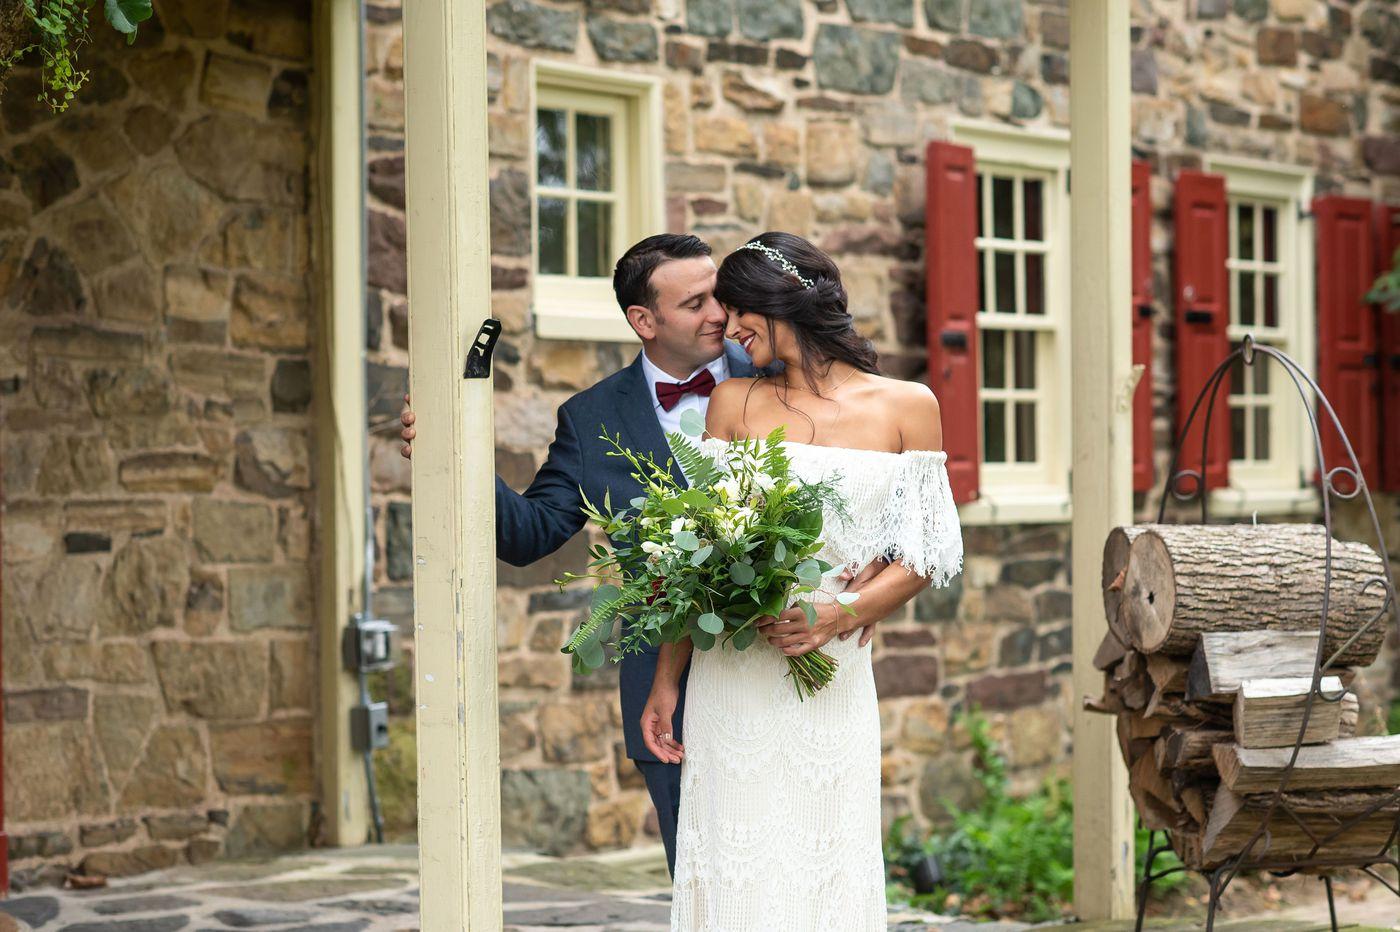 Philadelphia weddings: Kristina Kazanjian and Adam Belcastro